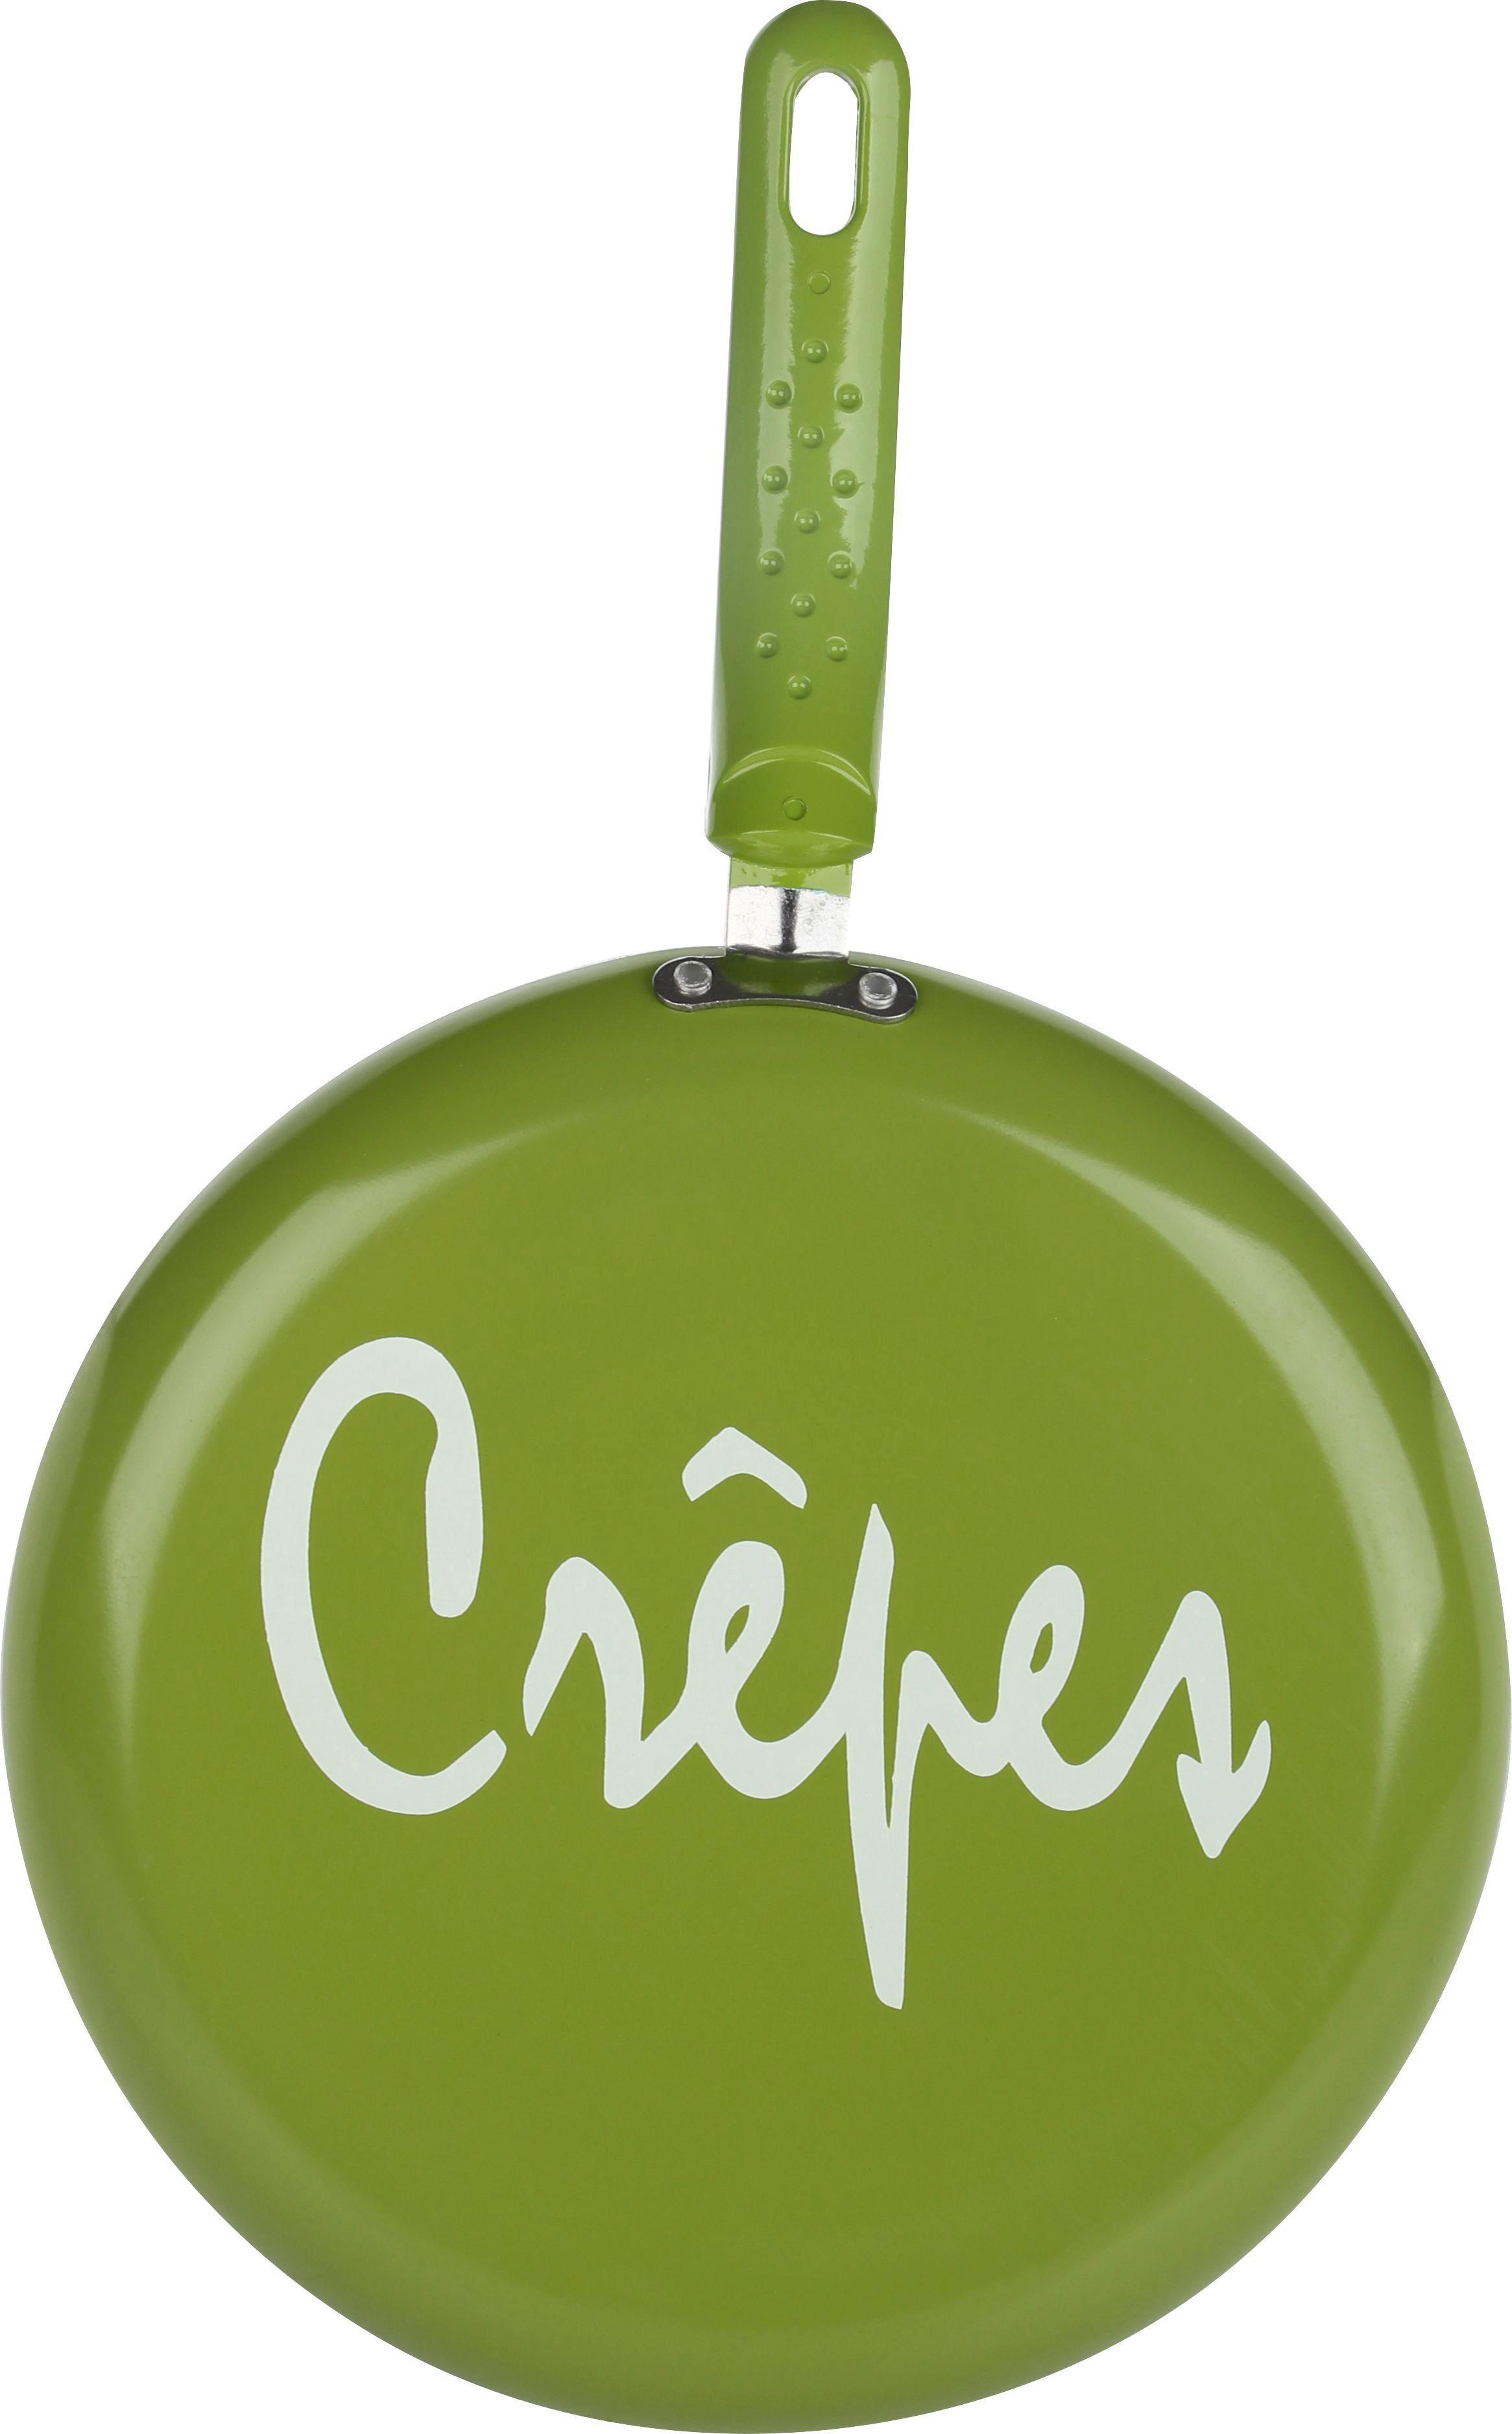 Crepespfanne Sherry in Grün - Grün, Kunststoff/Metall (26/2cm) - MÖMAX modern living